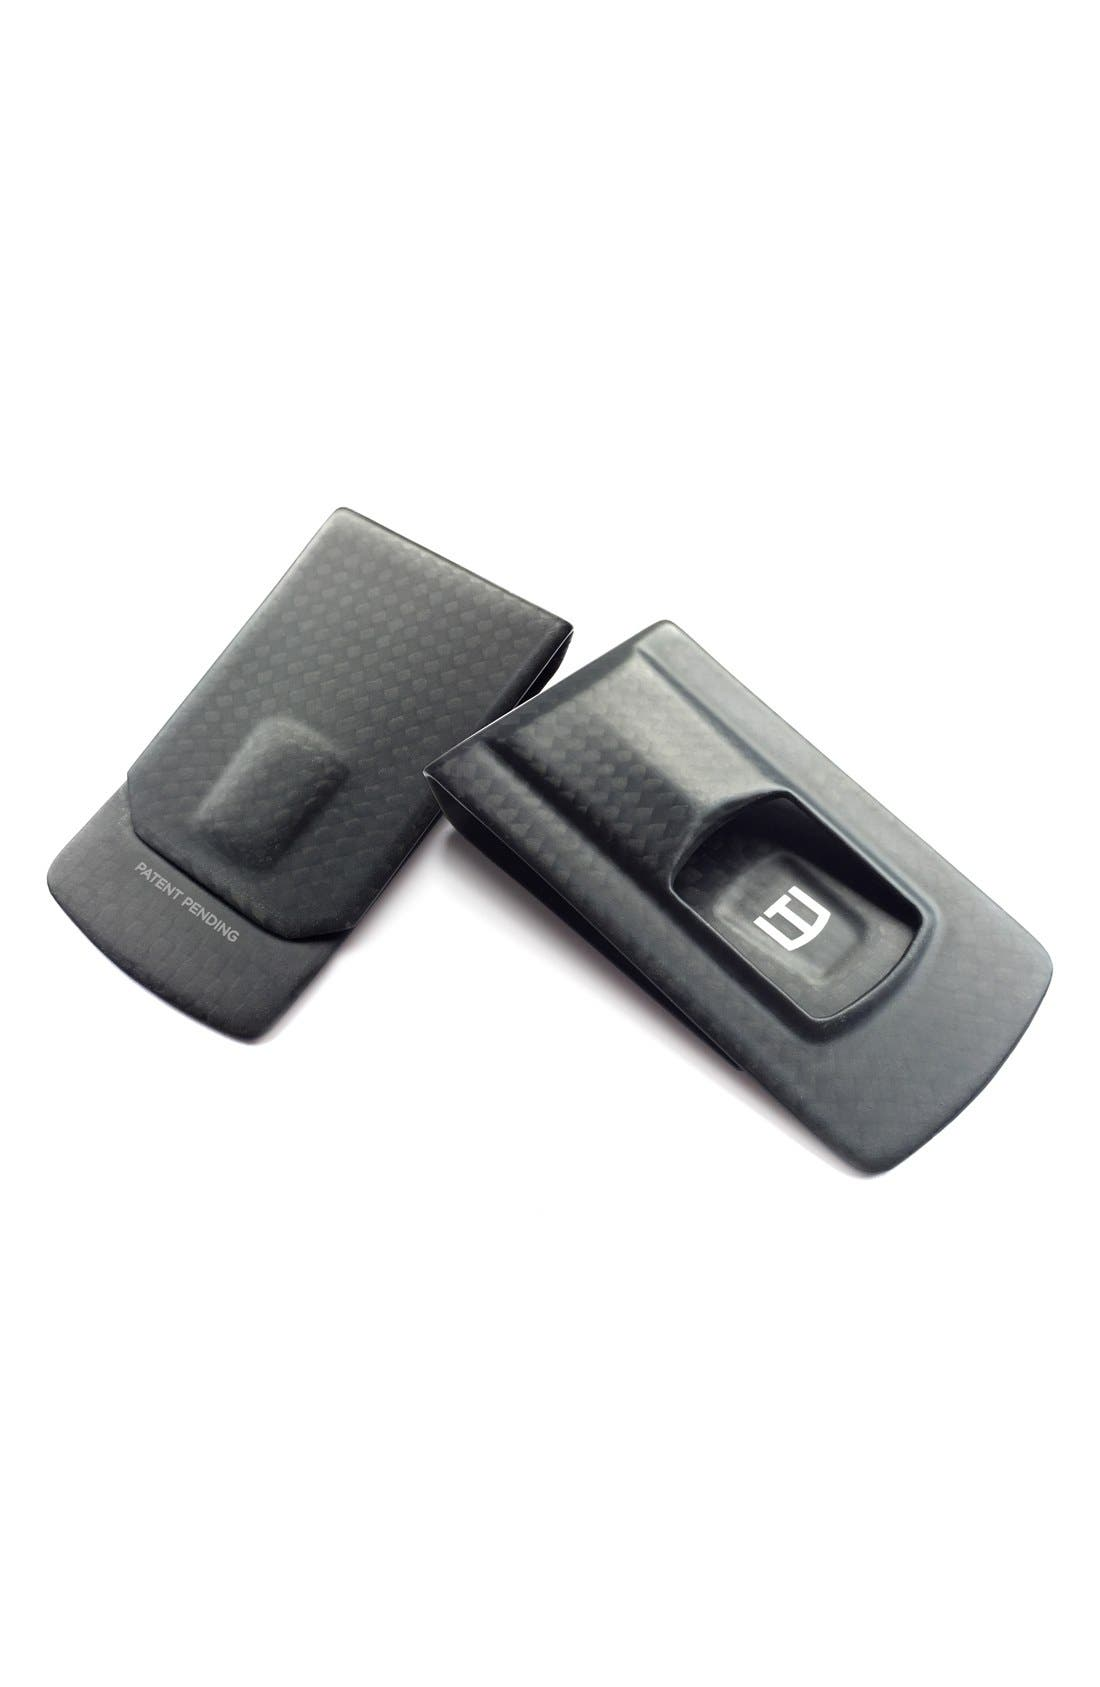 Carbon Fiber Money Clip,                         Main,                         color, Black Carbon Fiber